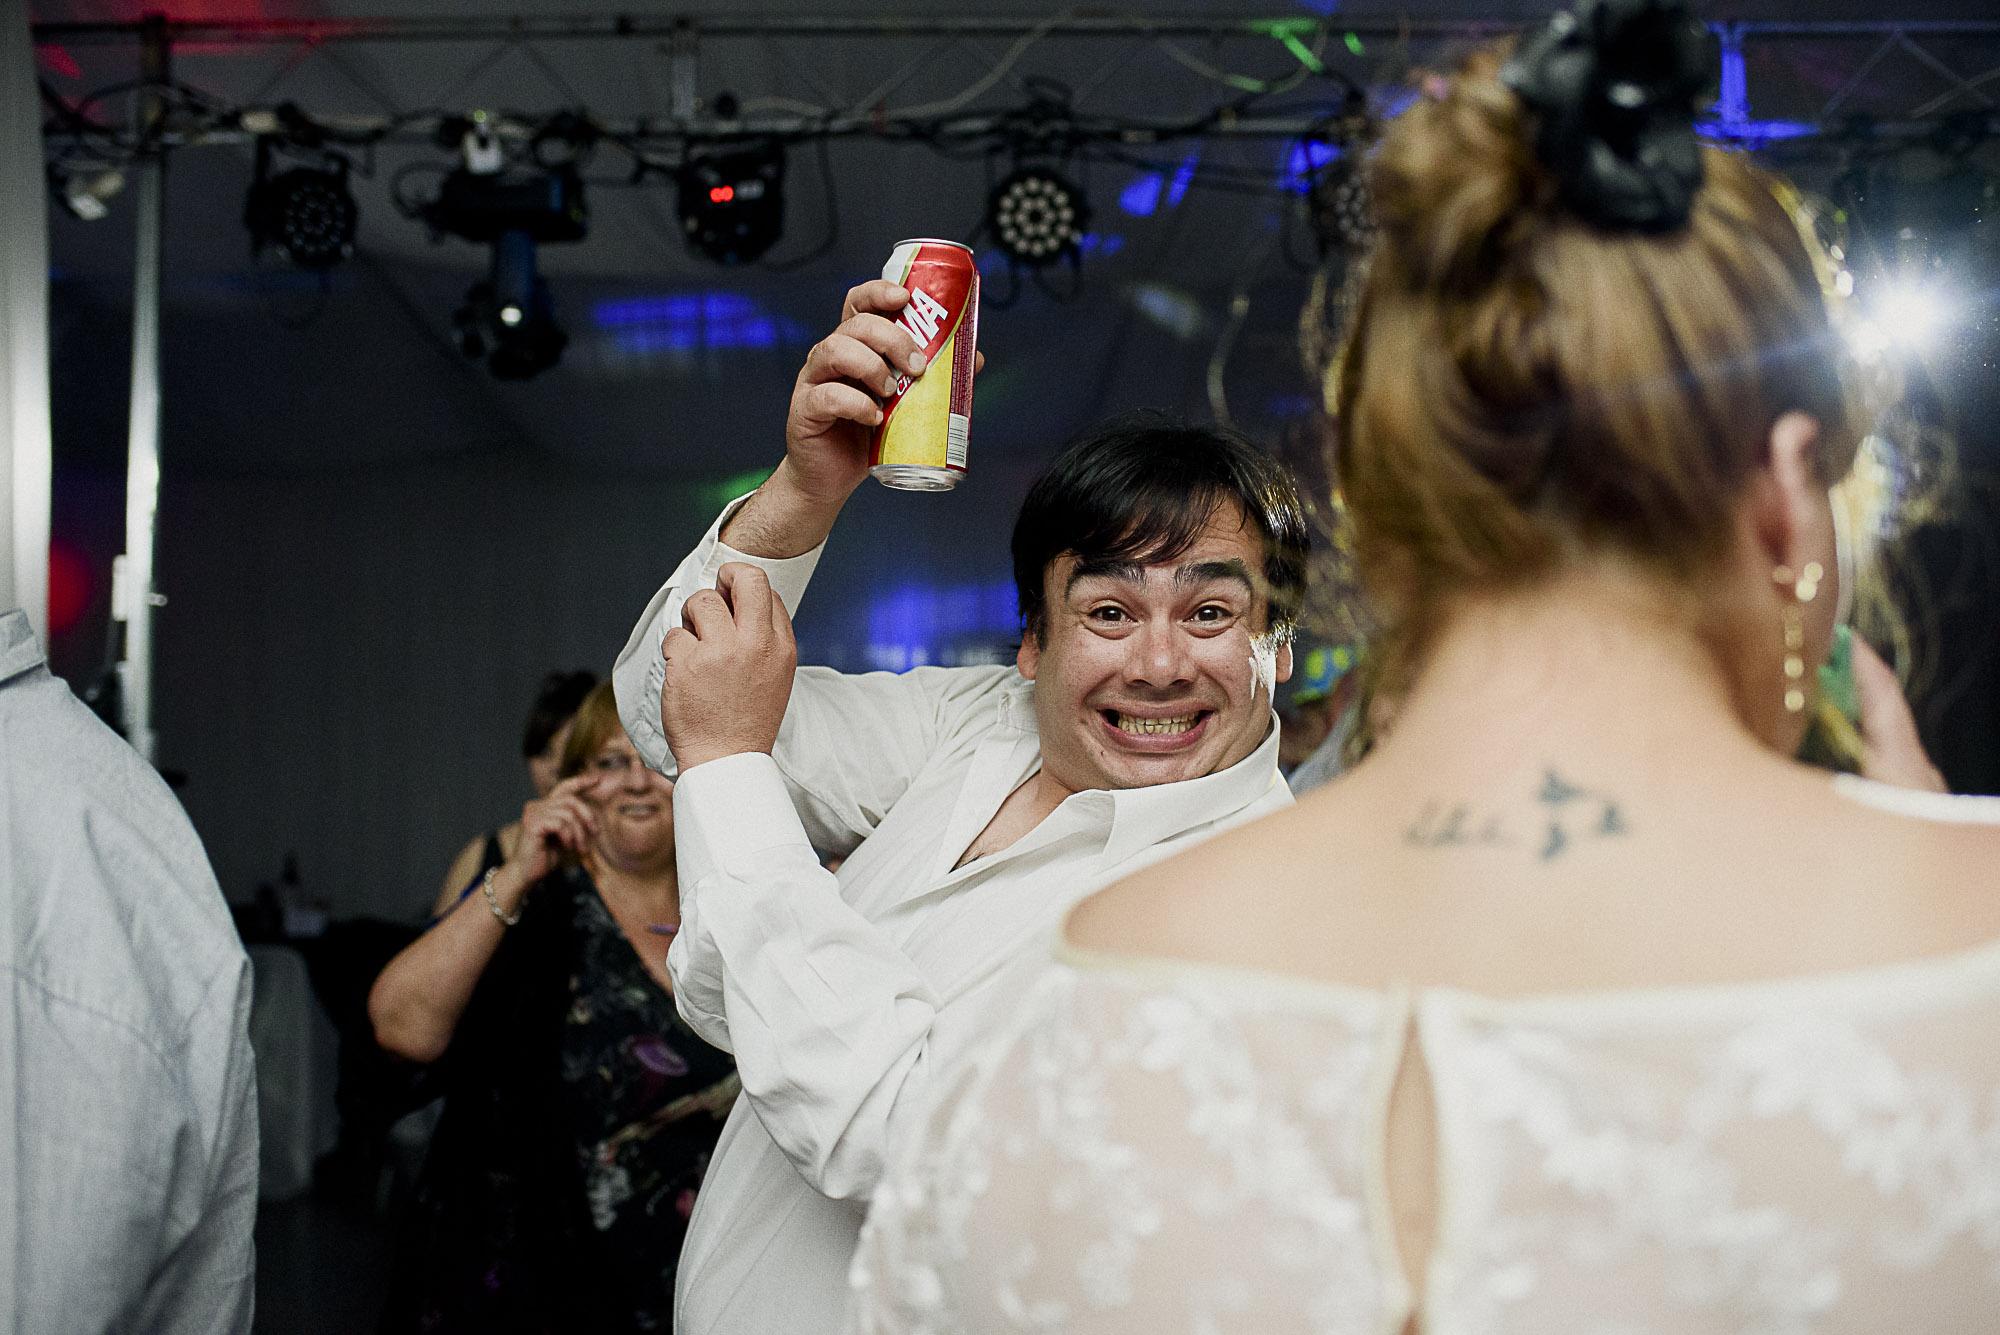 boda-vero-raul-patagonia-argentina-chilena-fotografo-de-bodas-argentina-casamiento-en-patagonia-gabriel-roa-photography-31